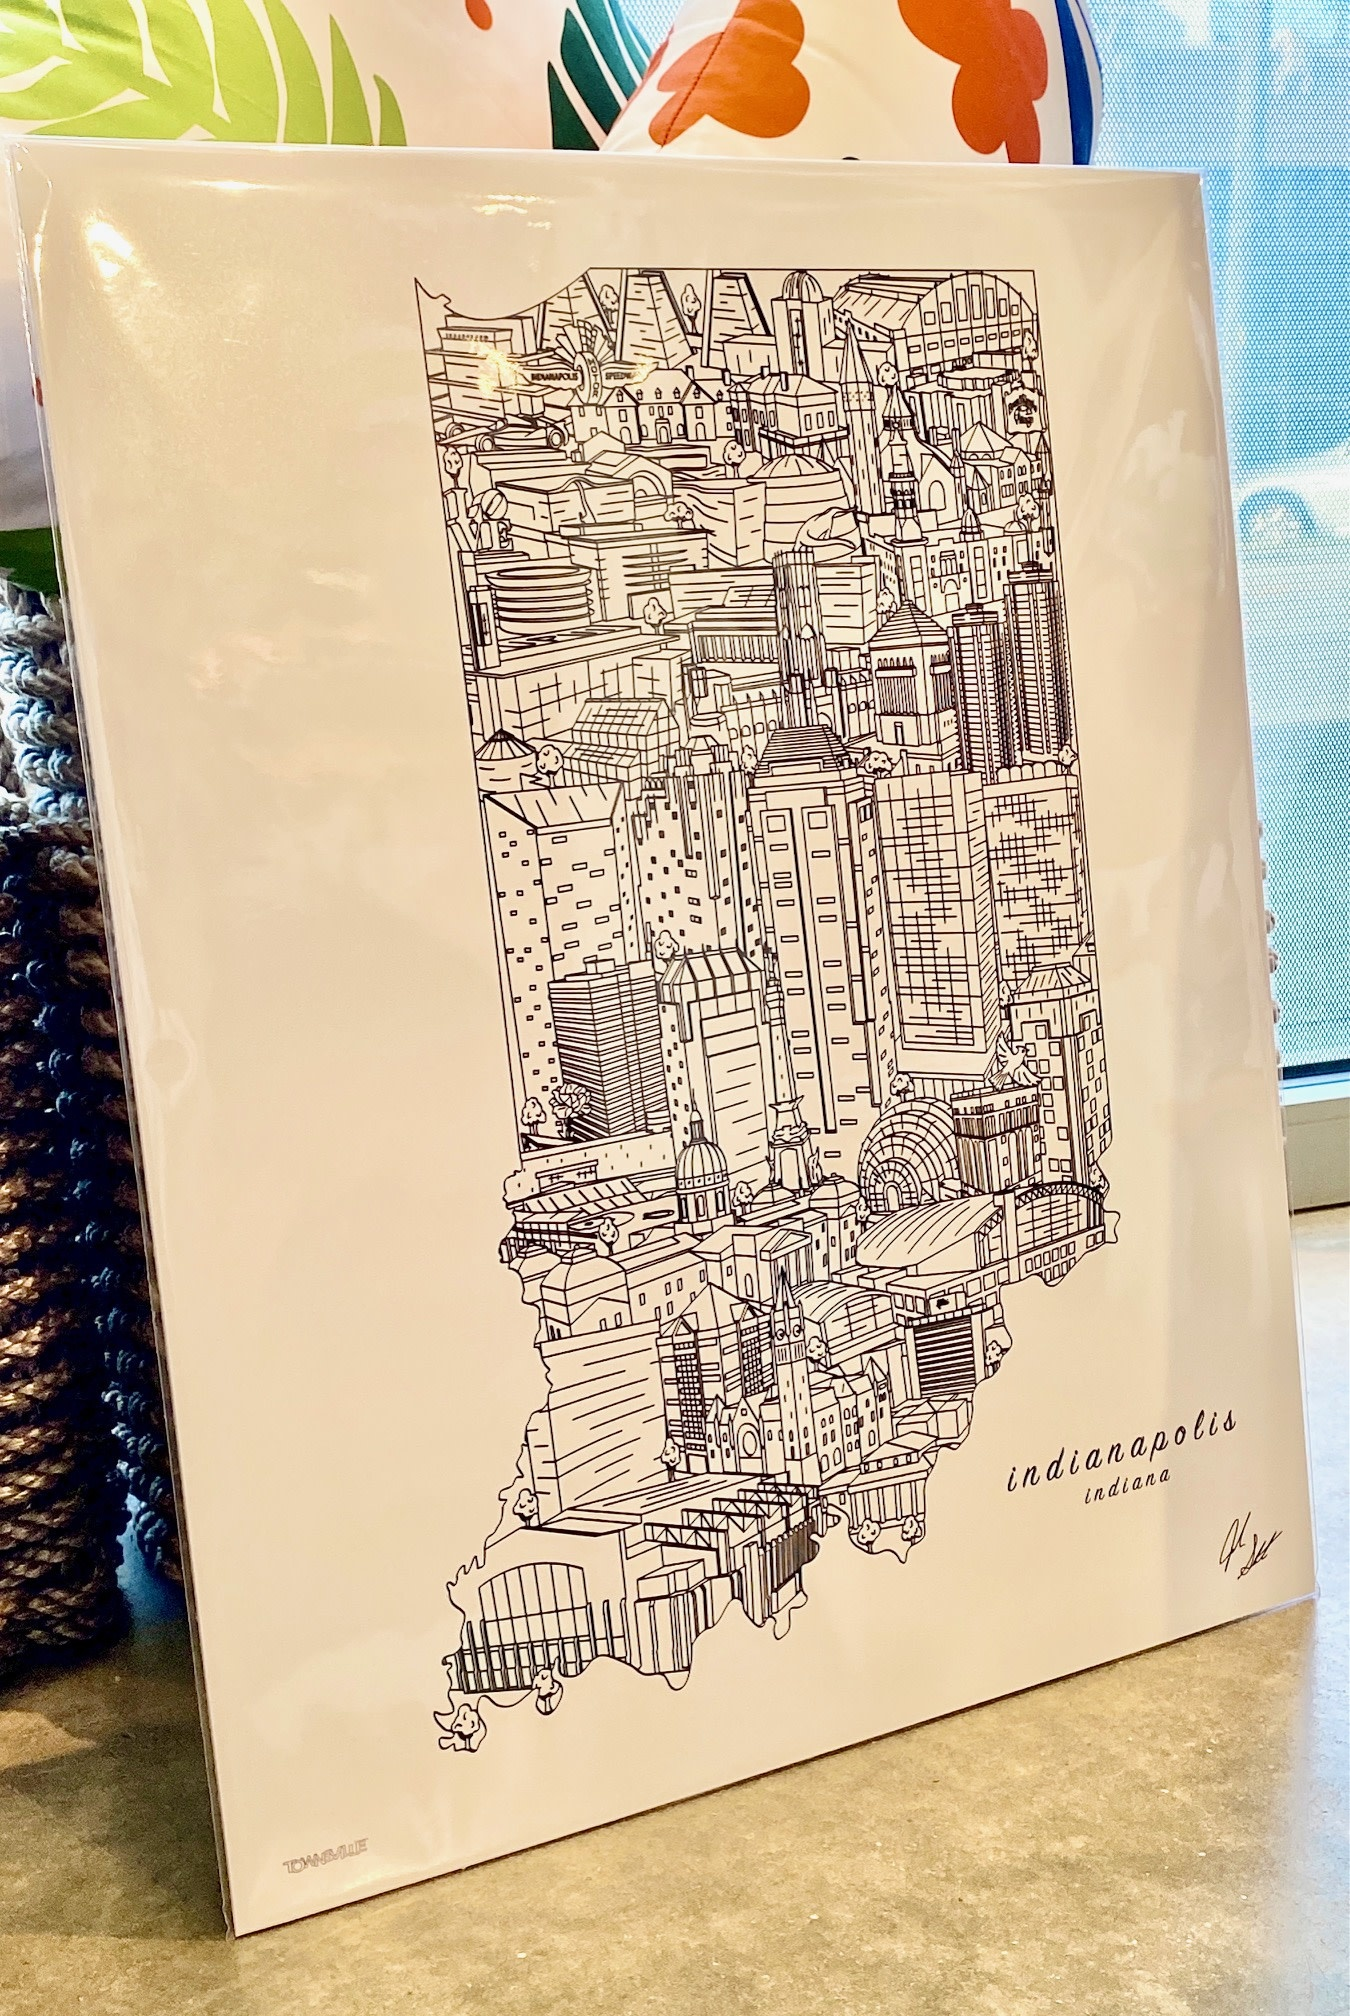 Townsville B&W: Indianapolis Landmarks 16x20 Art Print